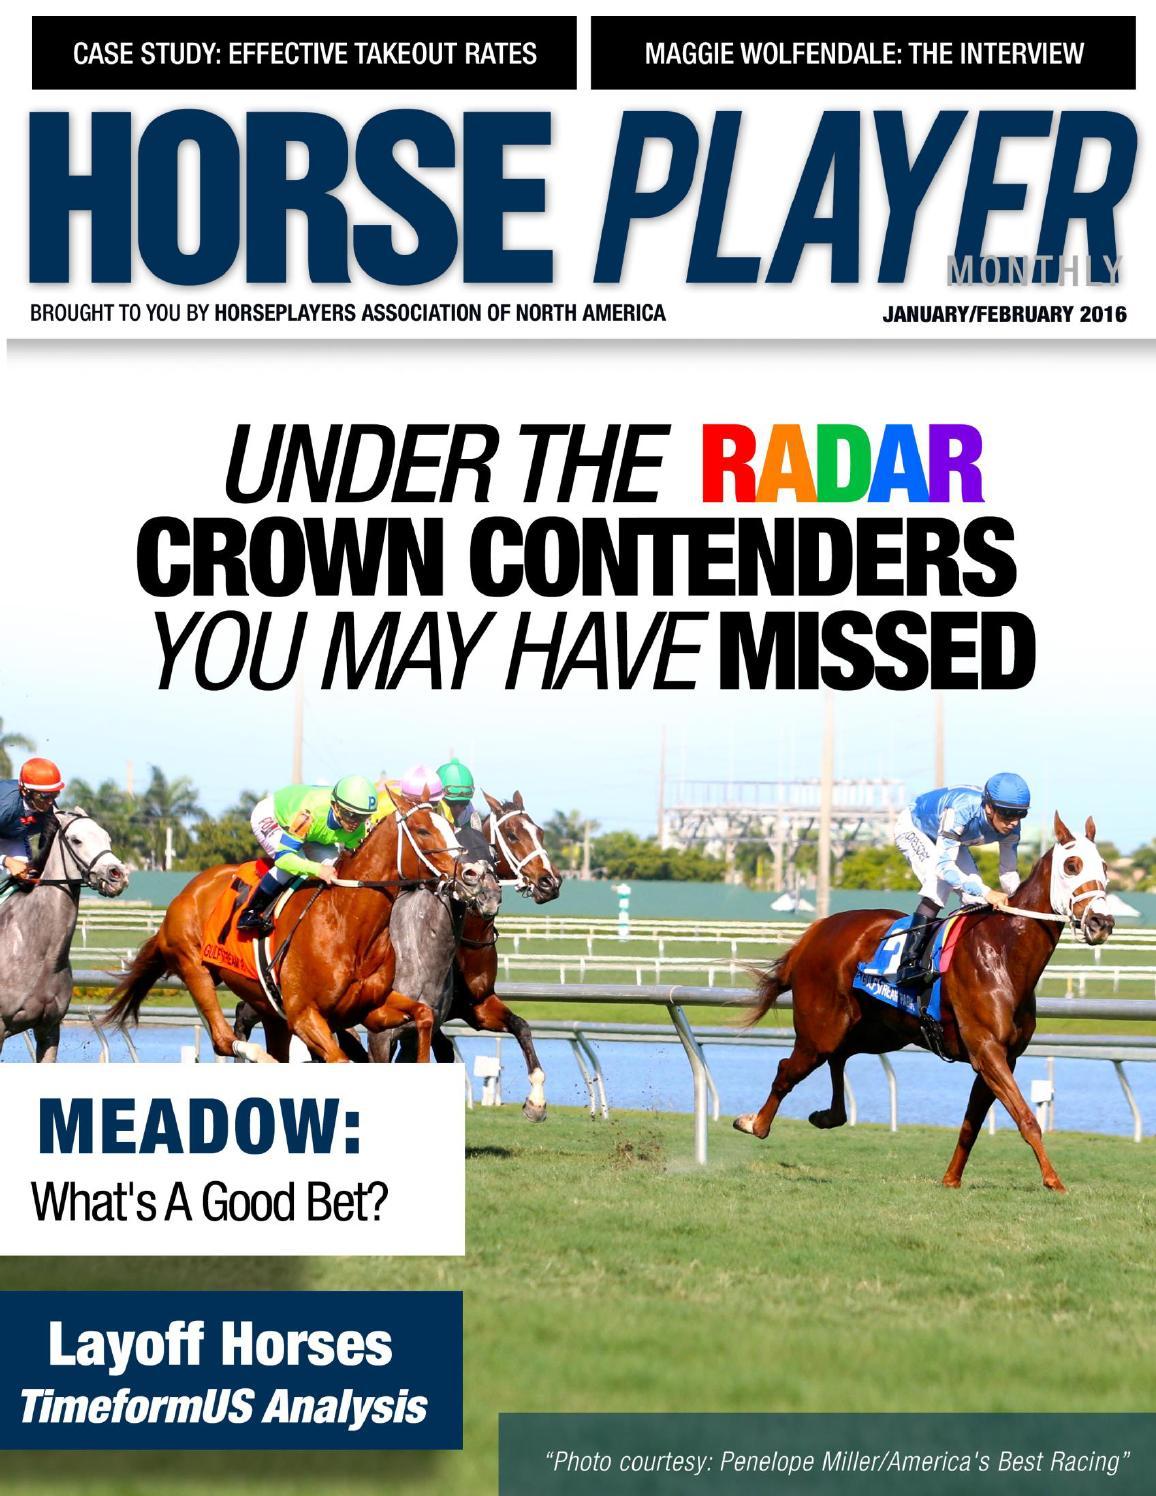 January/February 2016 Horseplayer Monthly by Charlie Davis - issuu